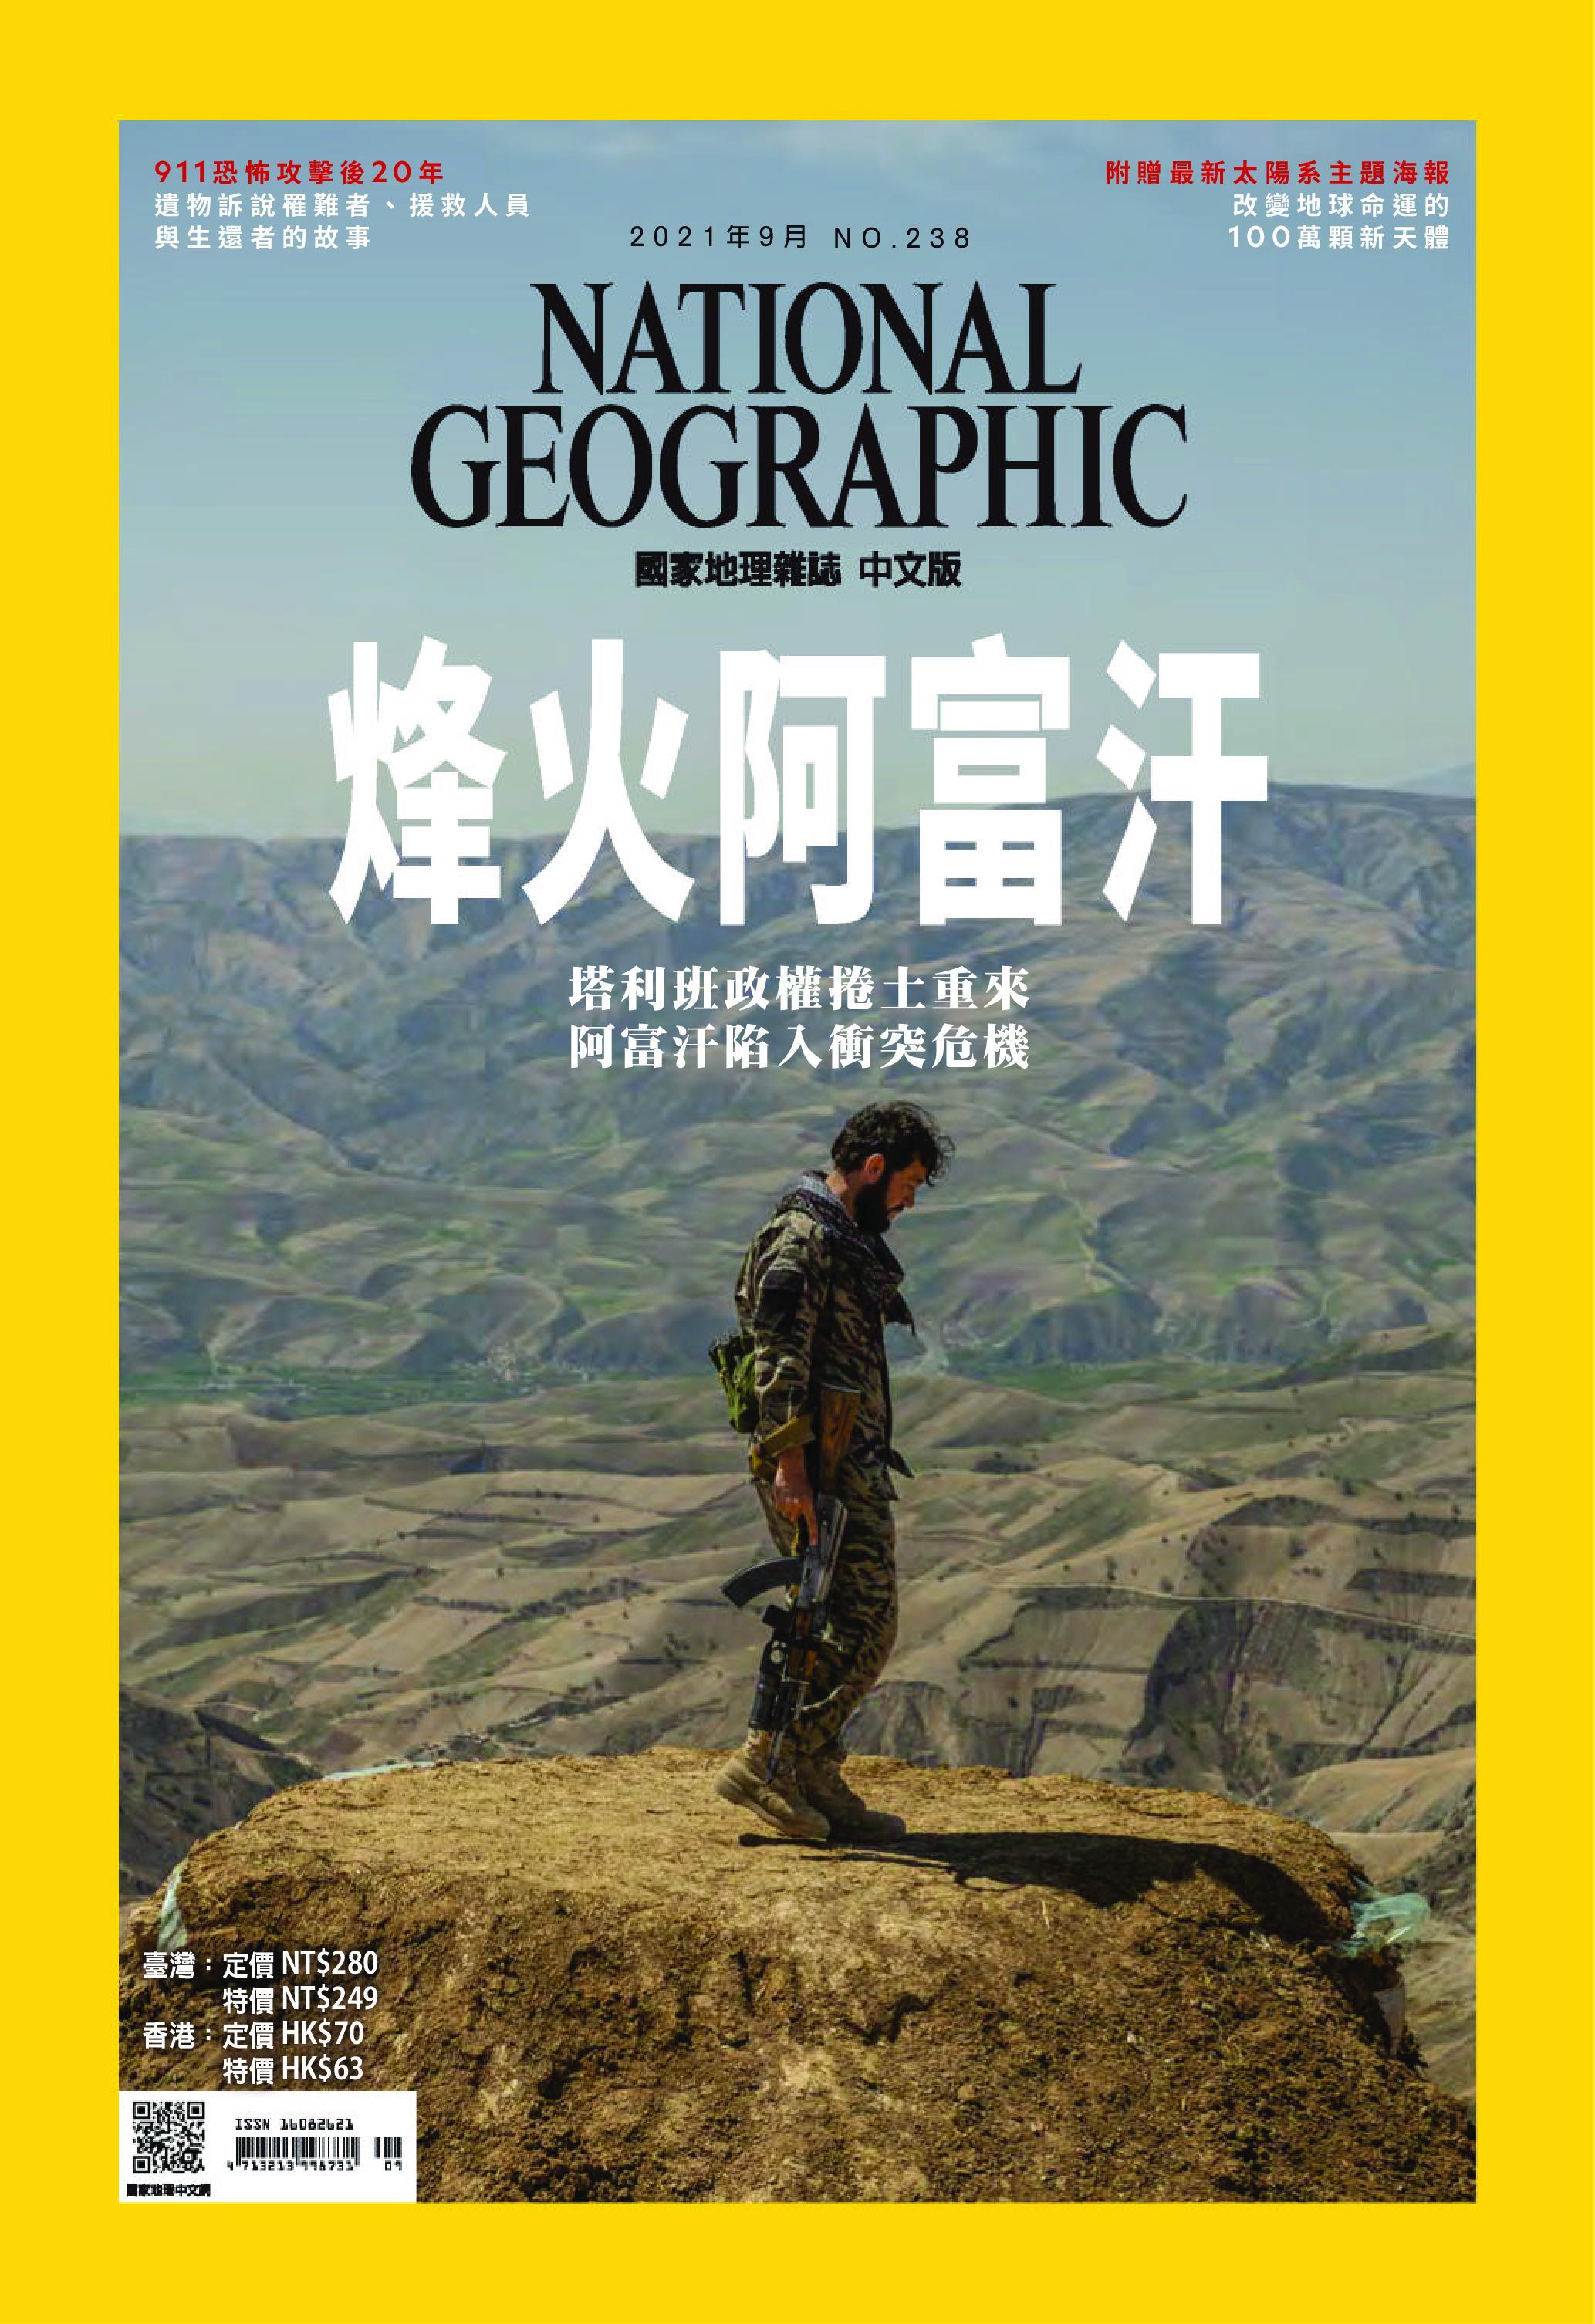 National Geographic Taiwan 國家地理雜誌中文版 - 九月 2021